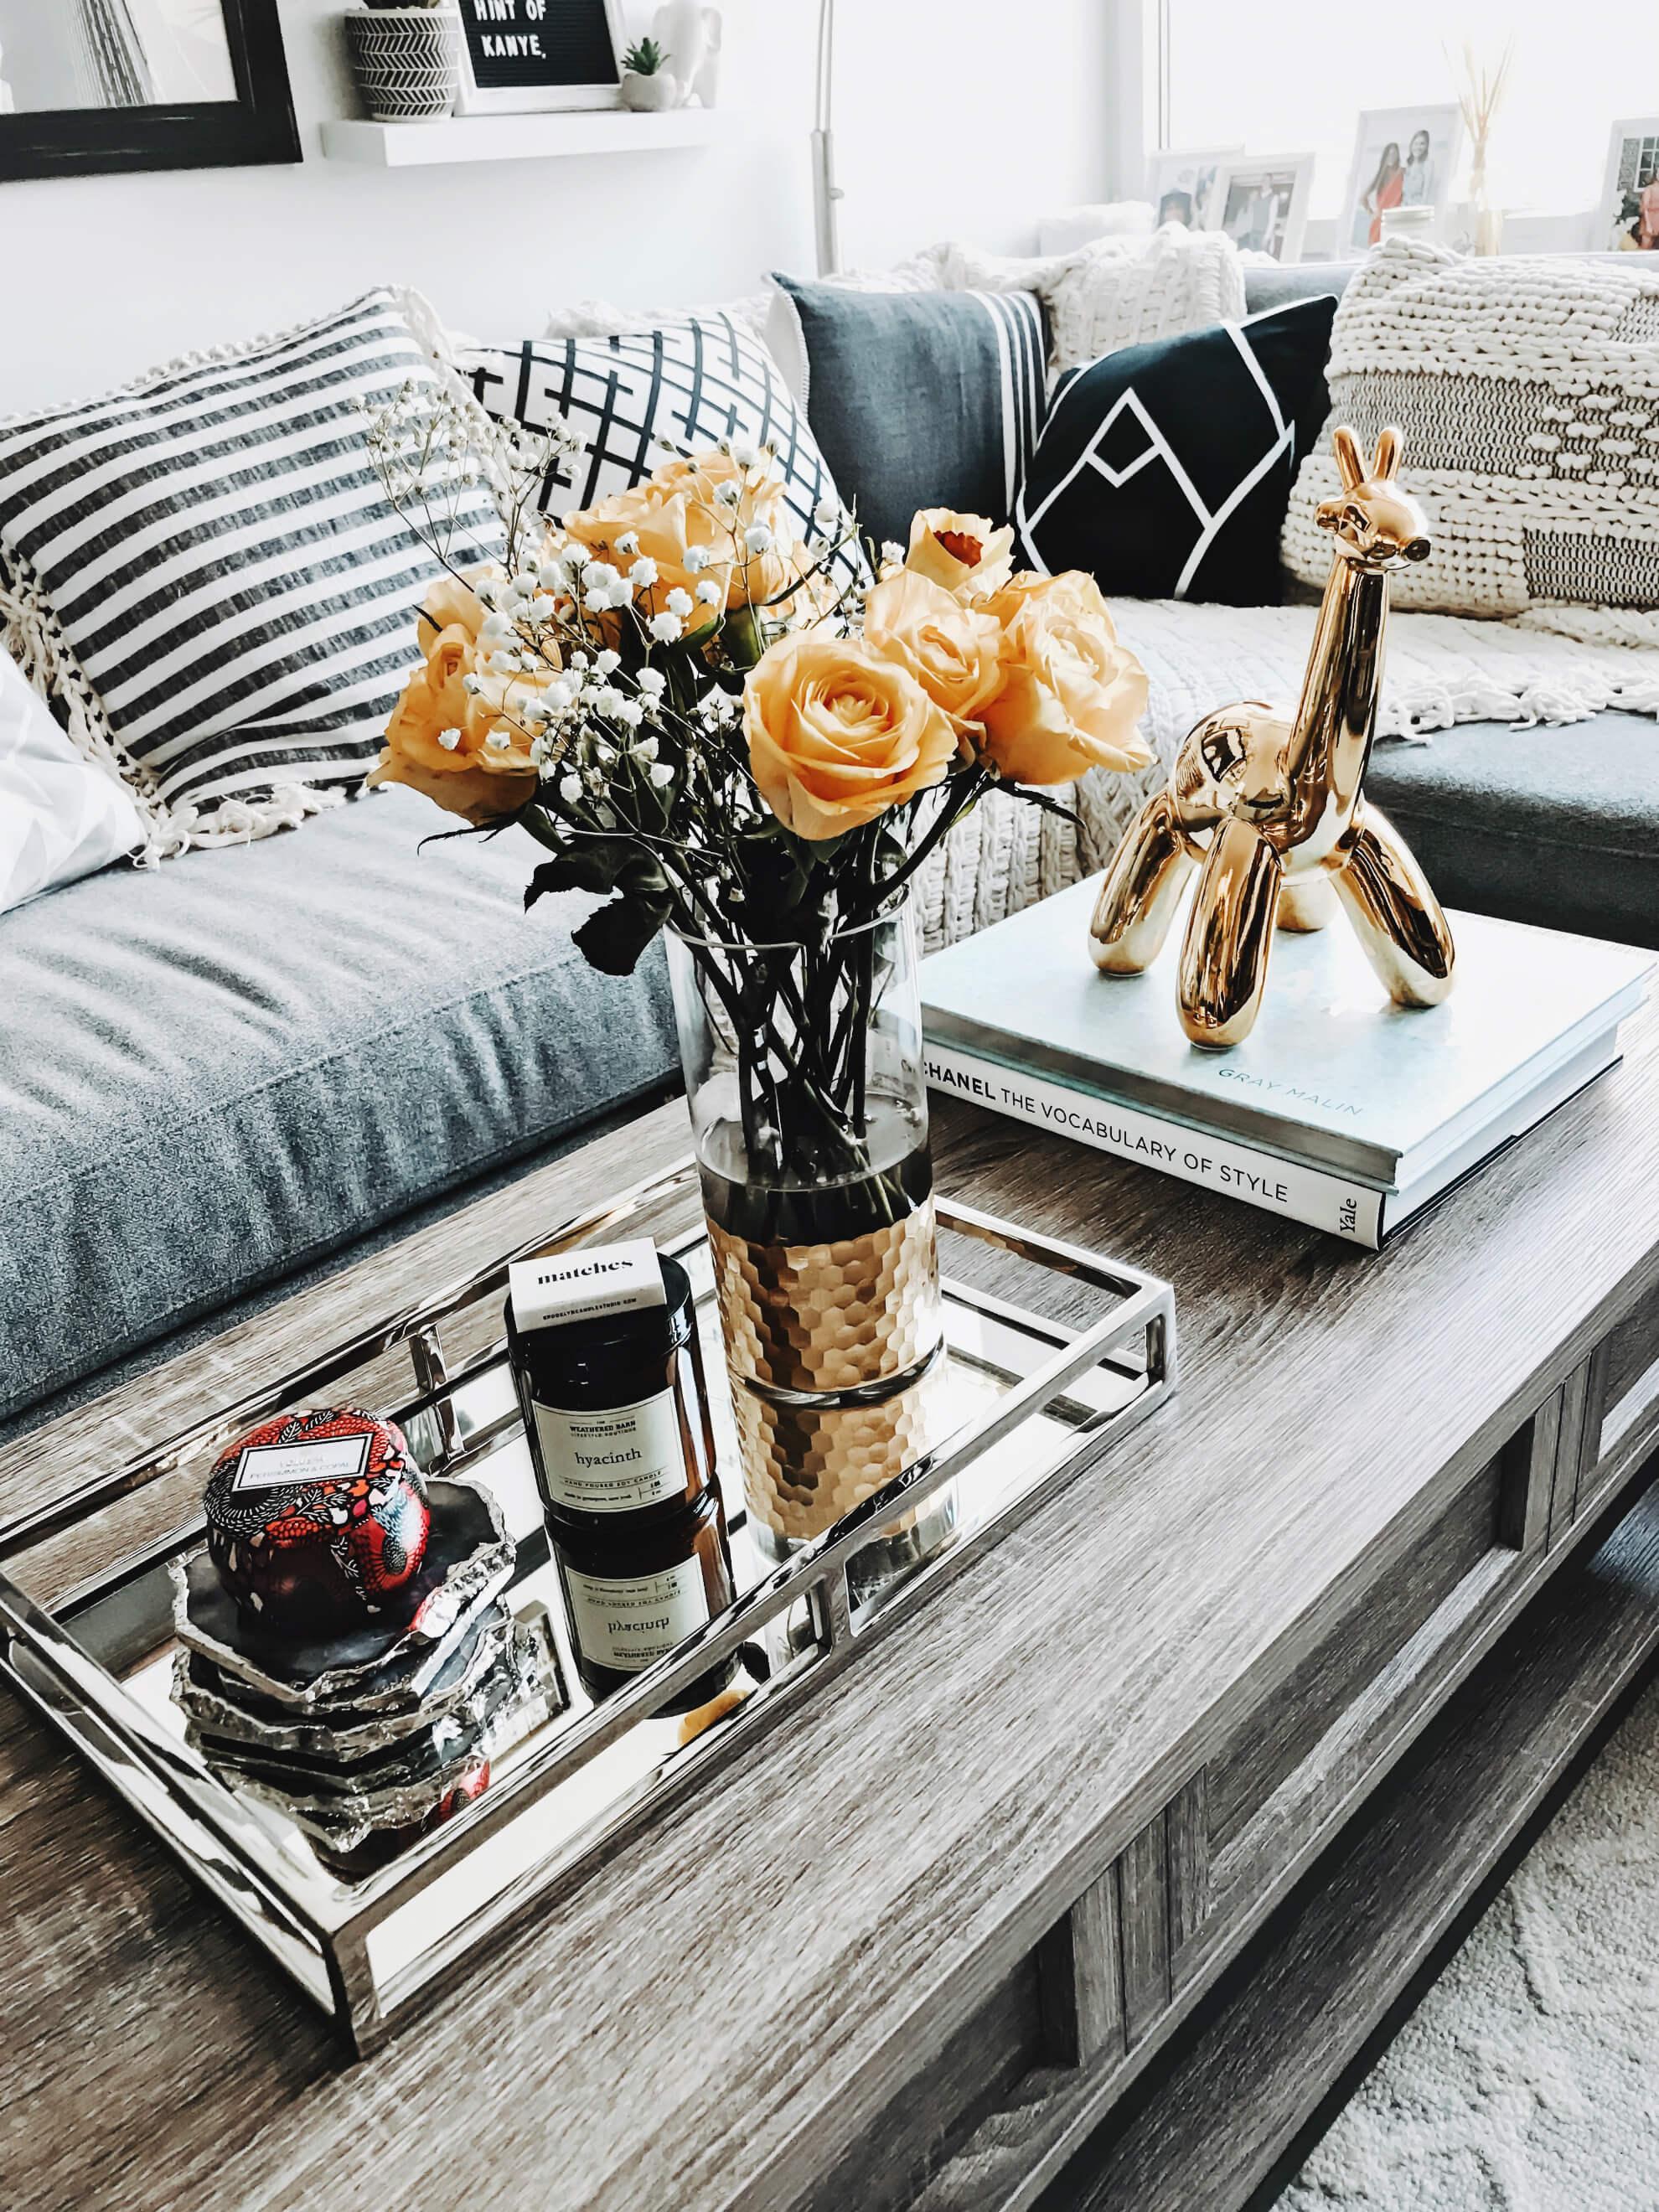 instagram worthy coffee table display